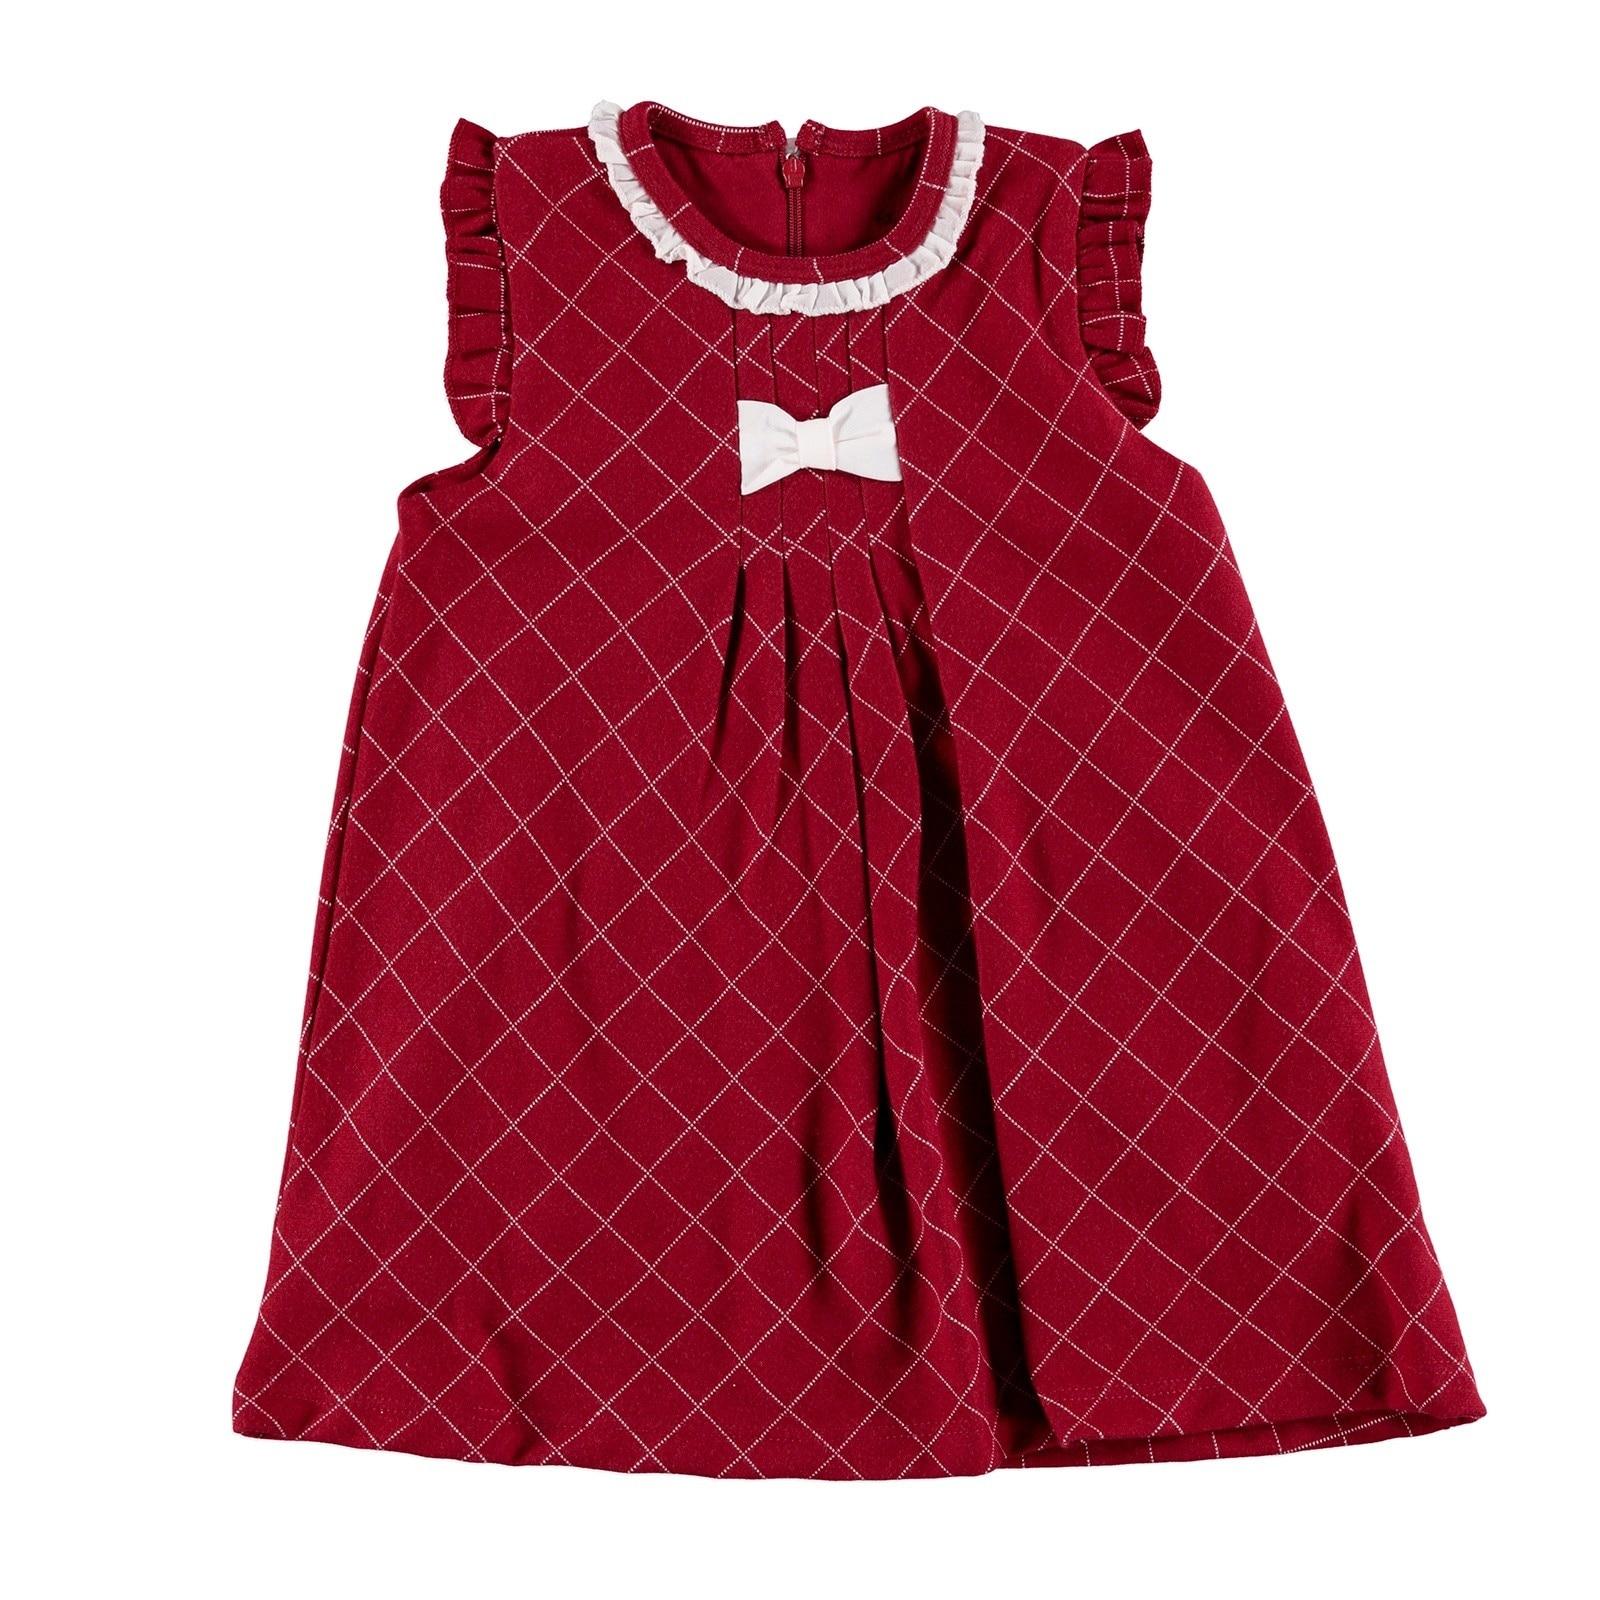 ebebek For My Baby Tale Ruffled Collar Bow Detail Sleeveless Dress